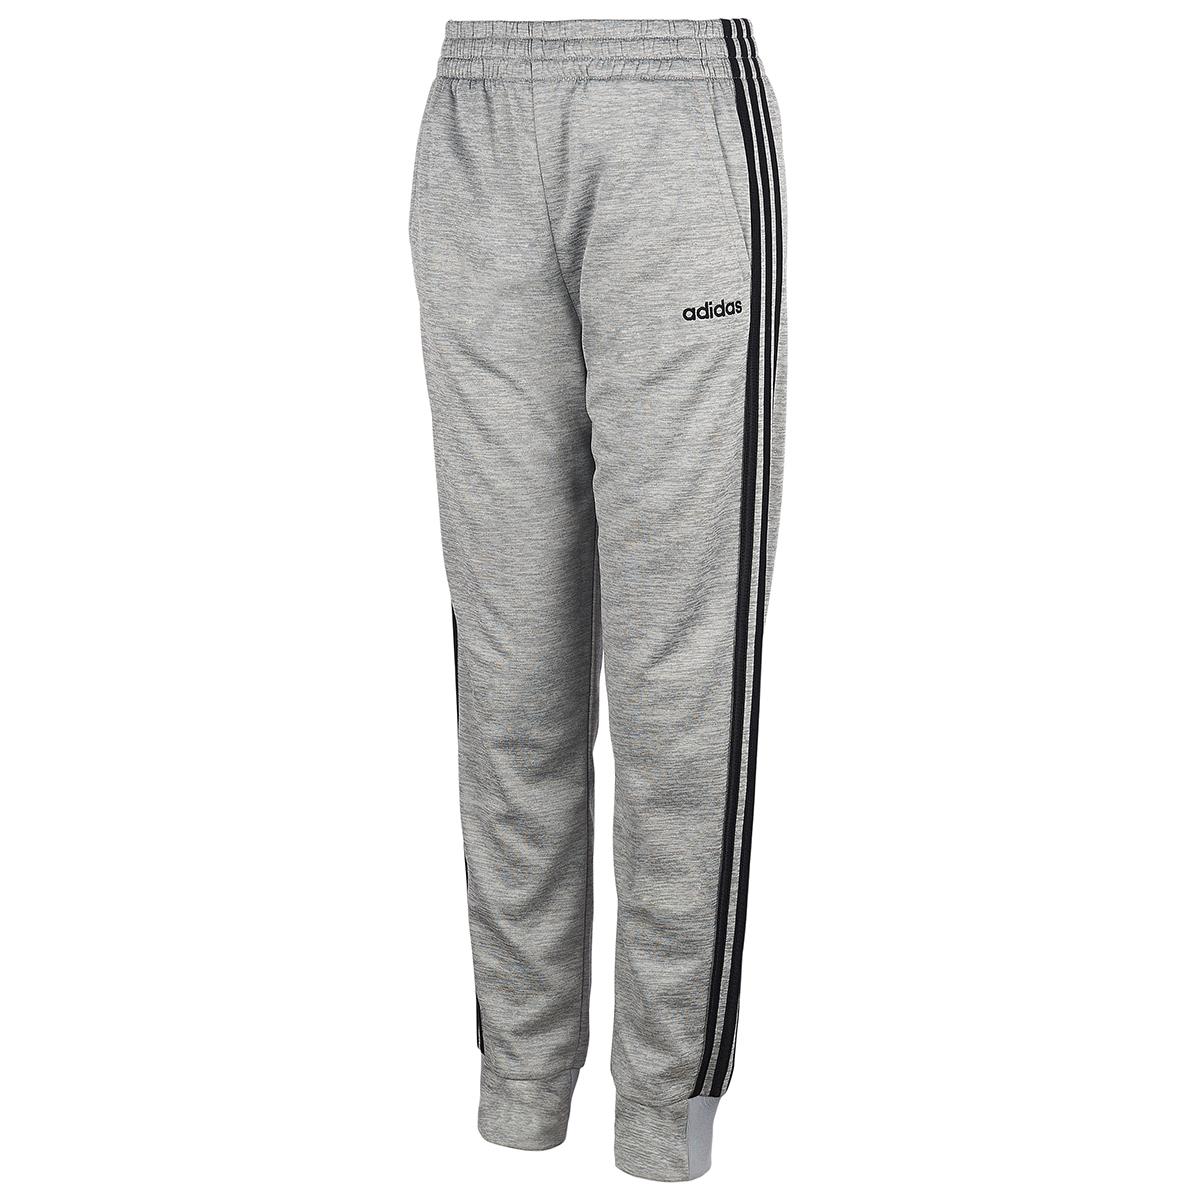 Adidas Boys' 8-20 Core Pants - Black, L